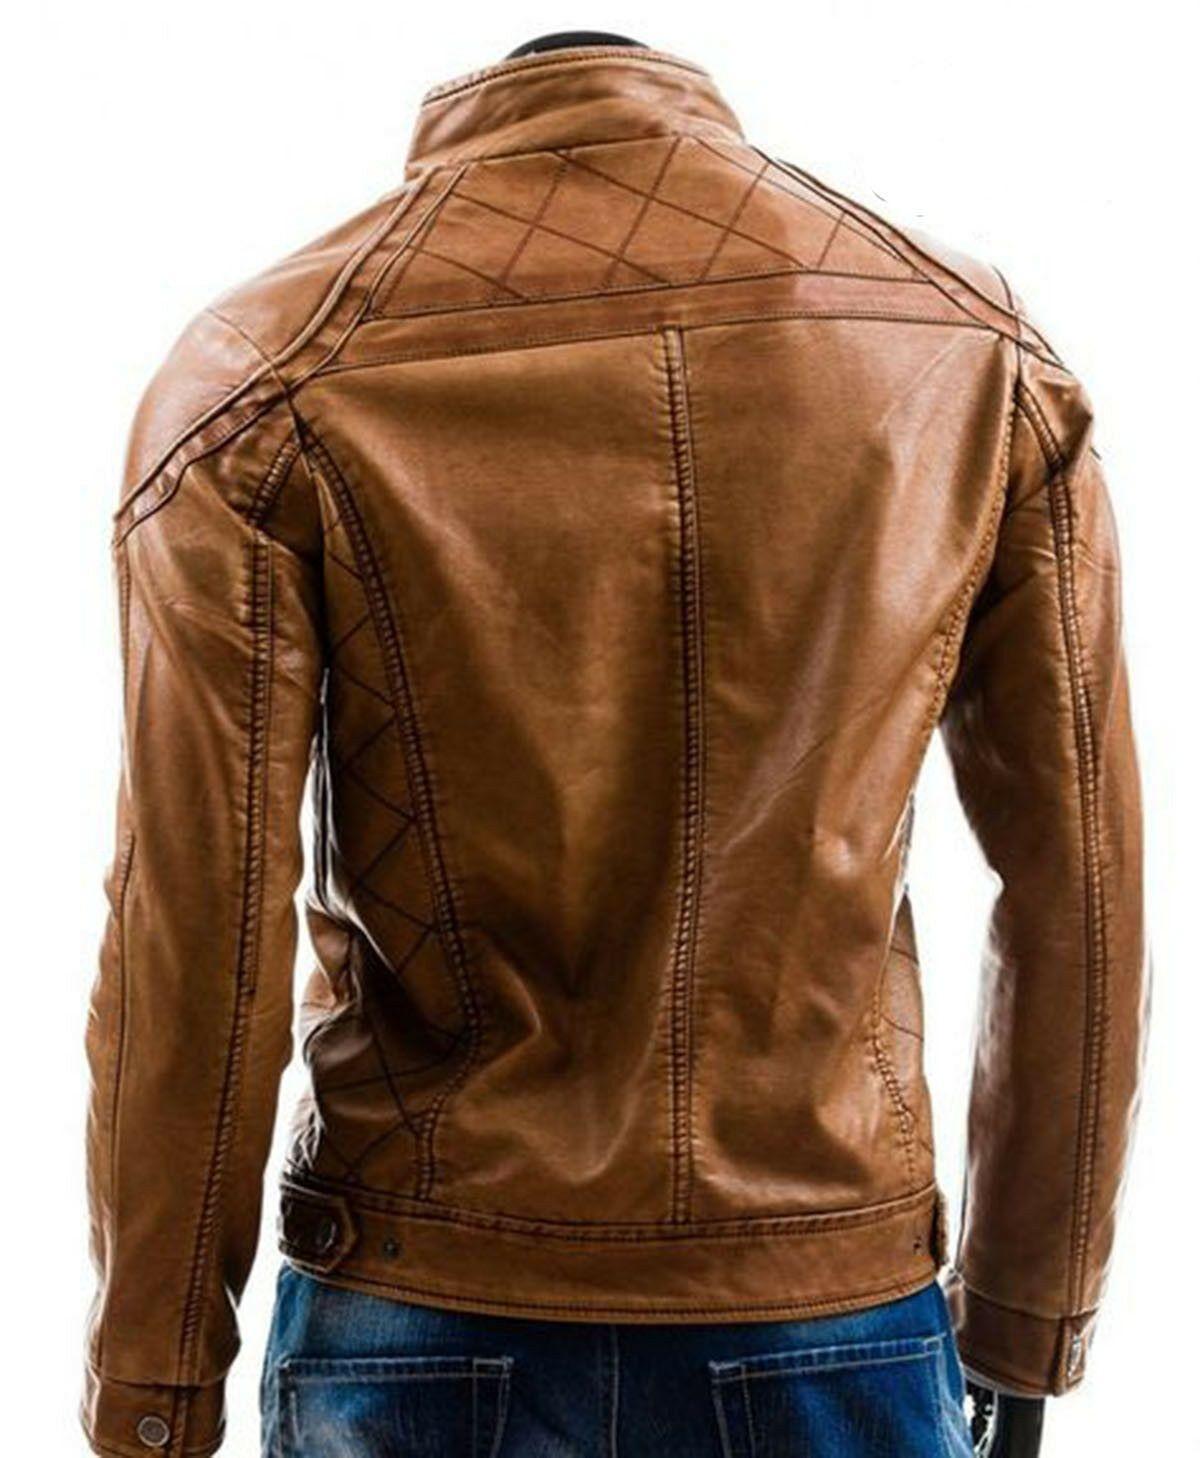 New Handmade Men S Genuine Brown Fashionable Biker Jacket Stylish Motorcycle Ja Leather Jacket Jackets Men Fashion Leather Jacket Men [ 1458 x 1200 Pixel ]